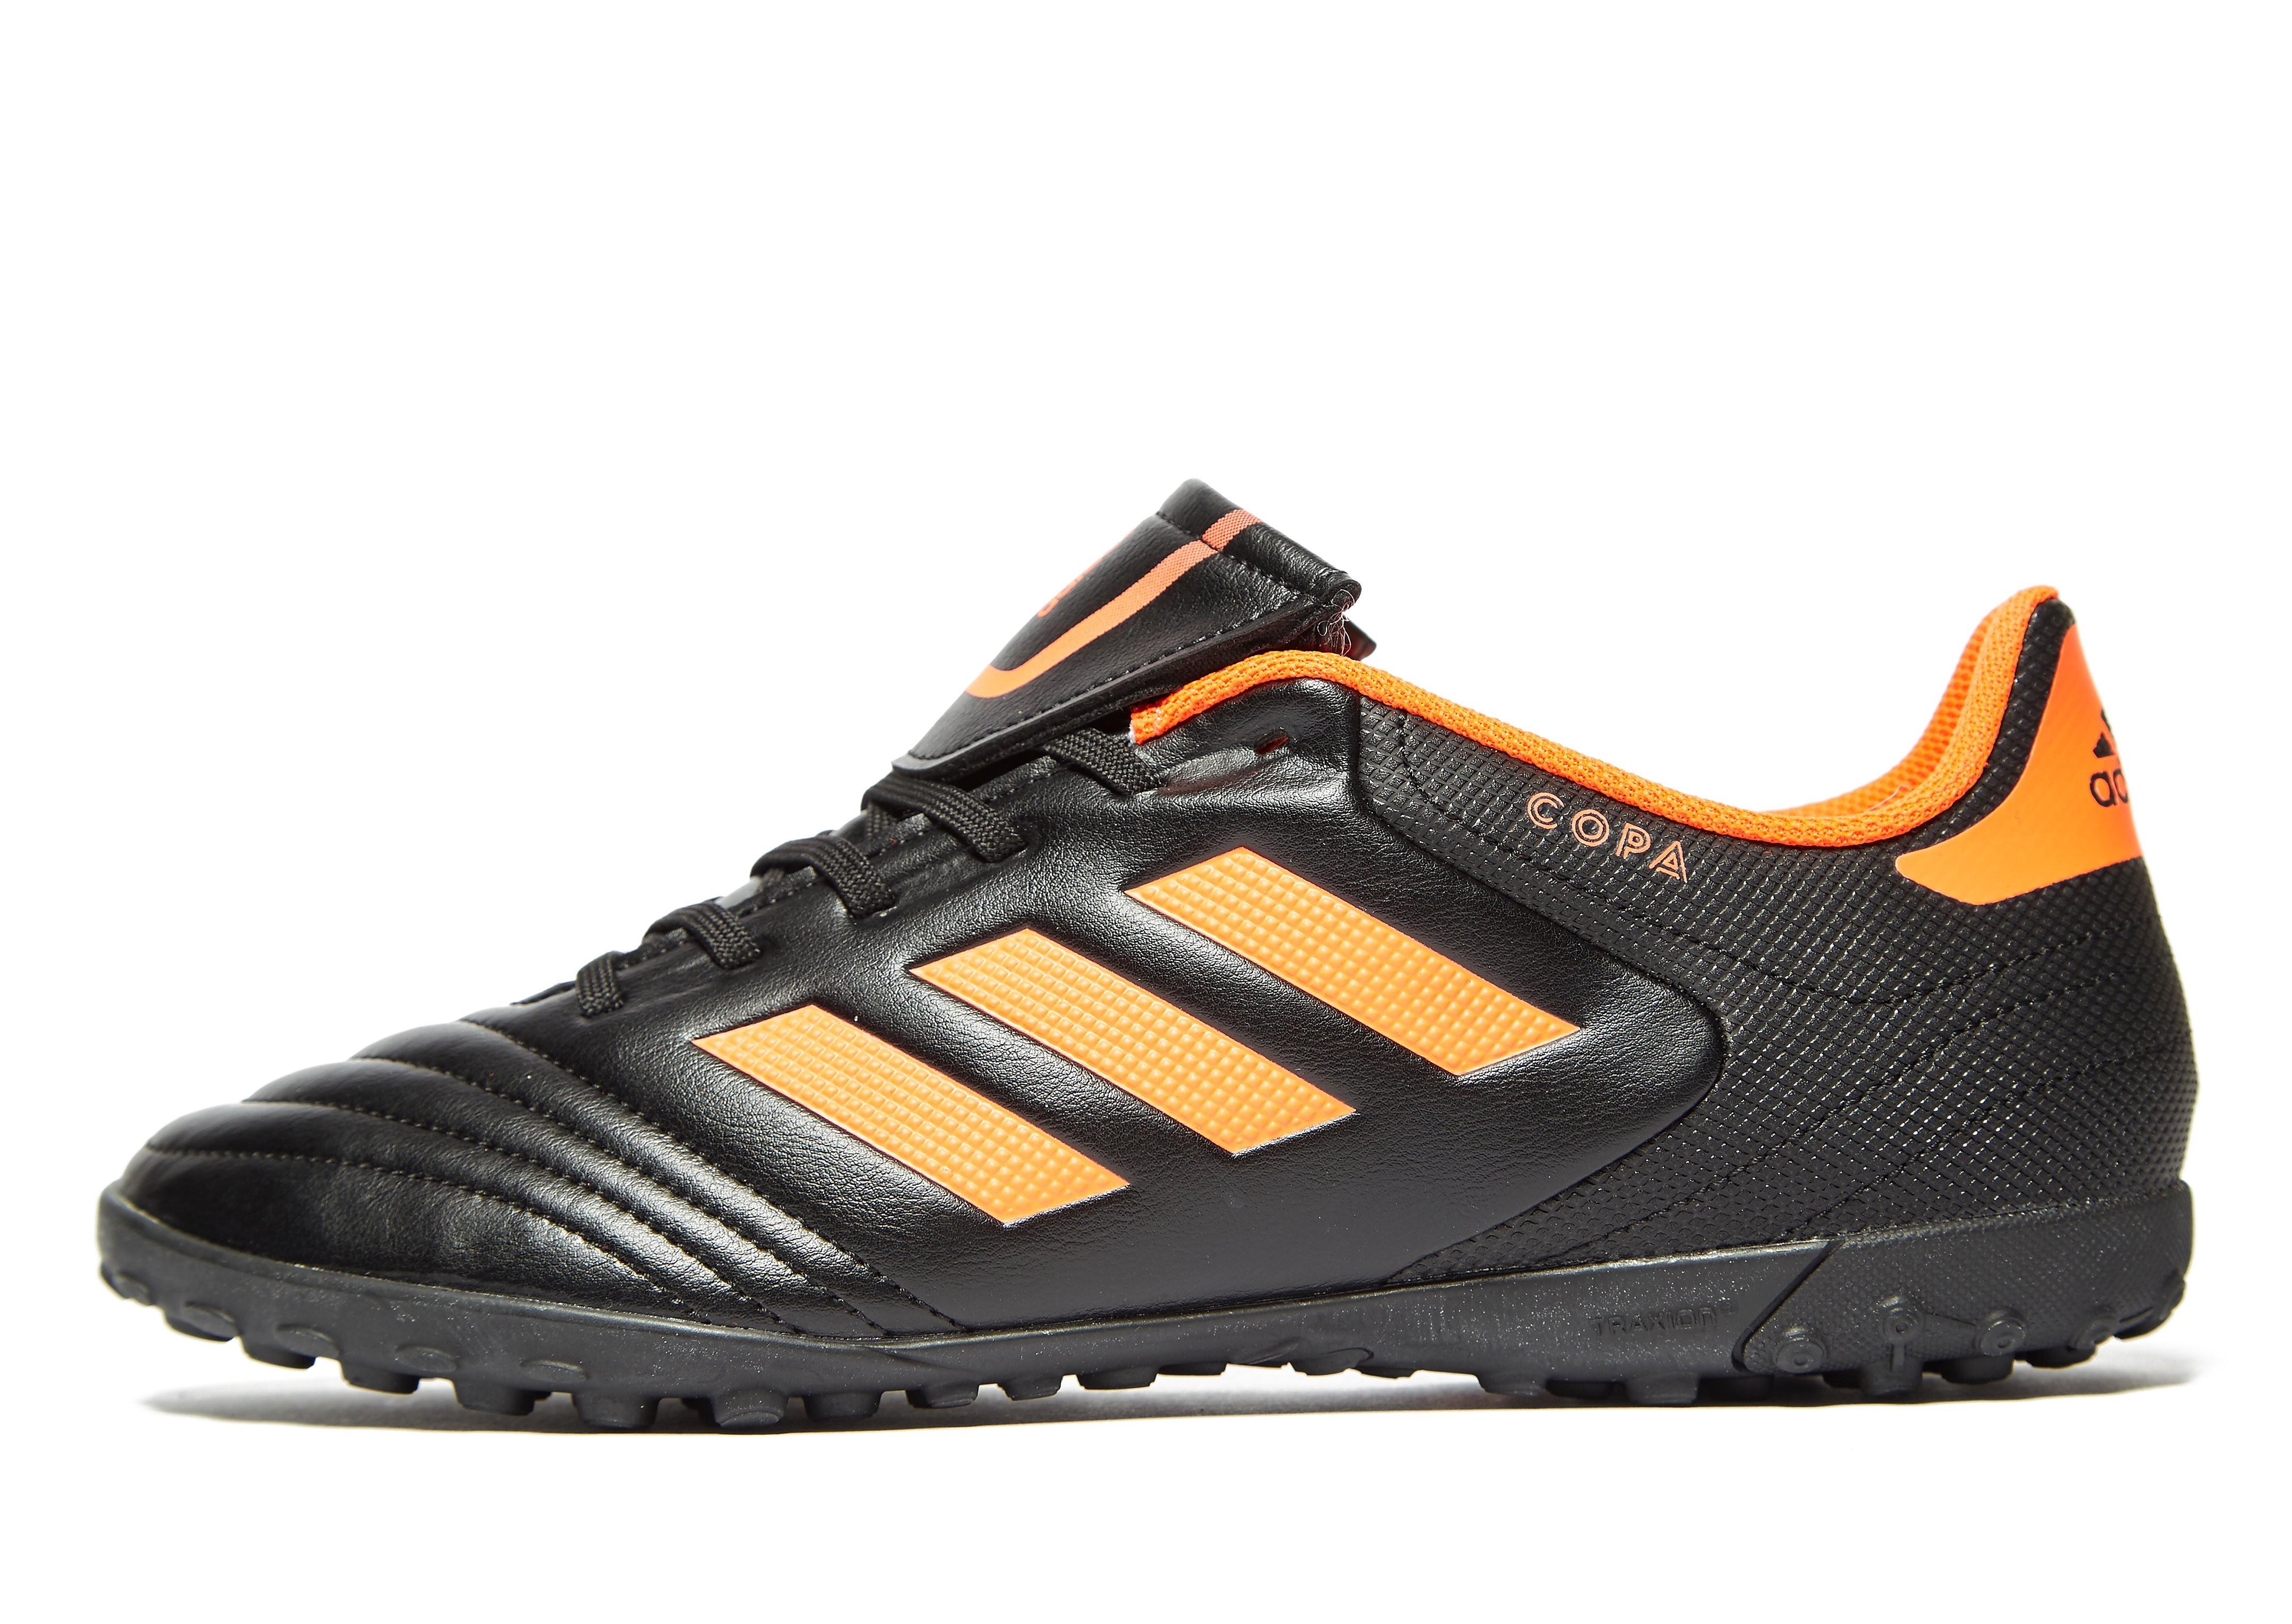 adidas Pyro Storm Copa 17.4 TF